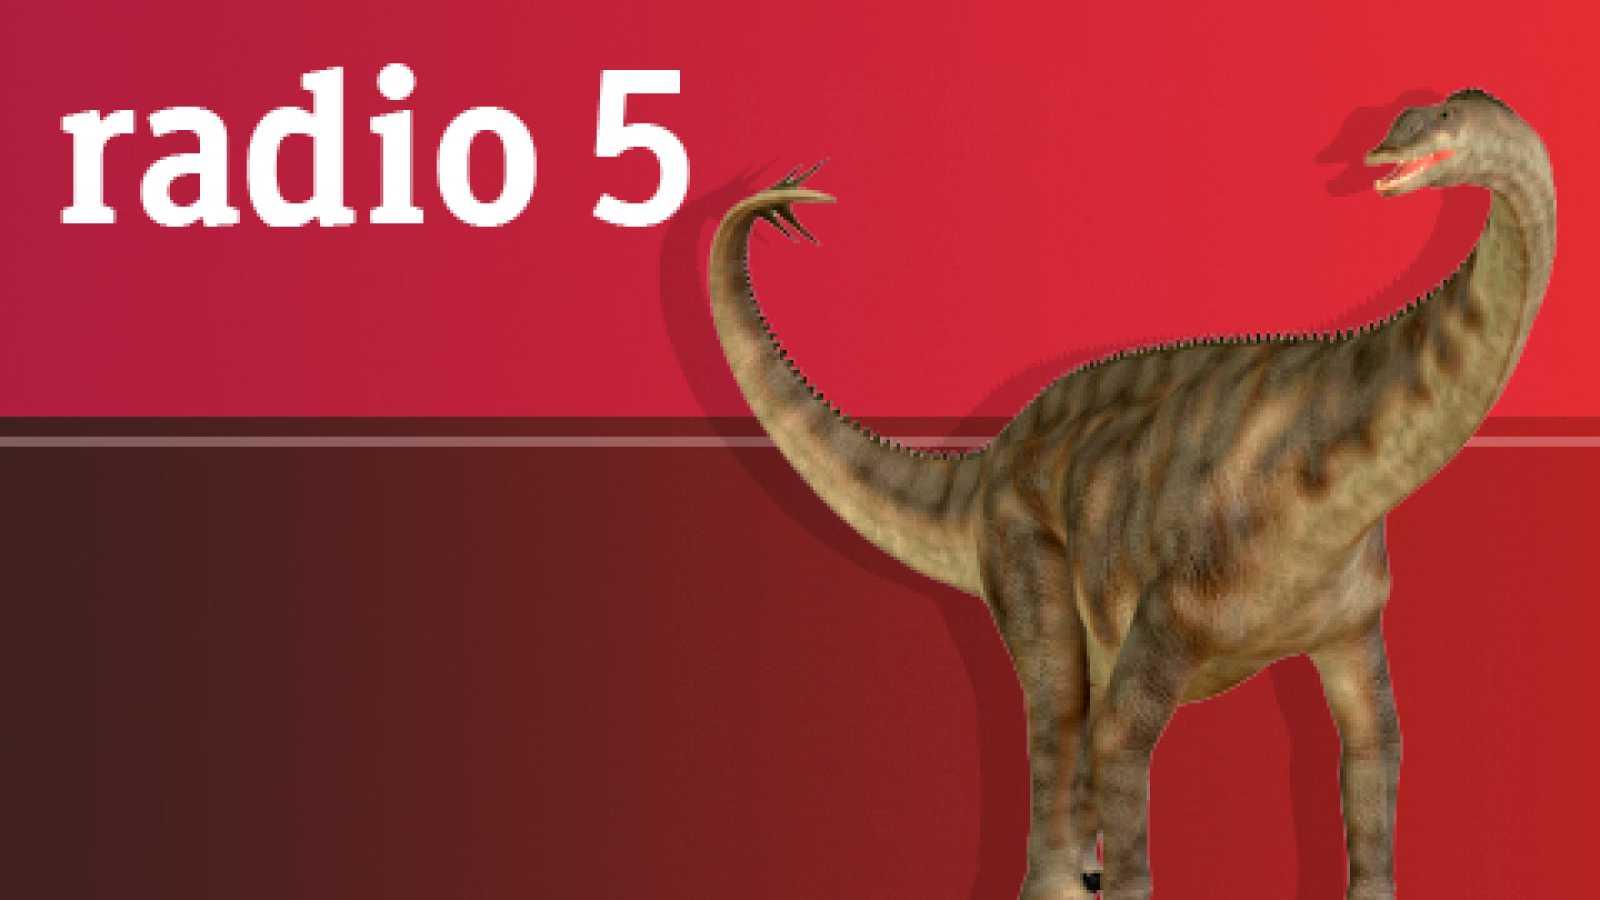 Lógica paleontológica - Paleonturología - 28/09/18 - escuchar ahora